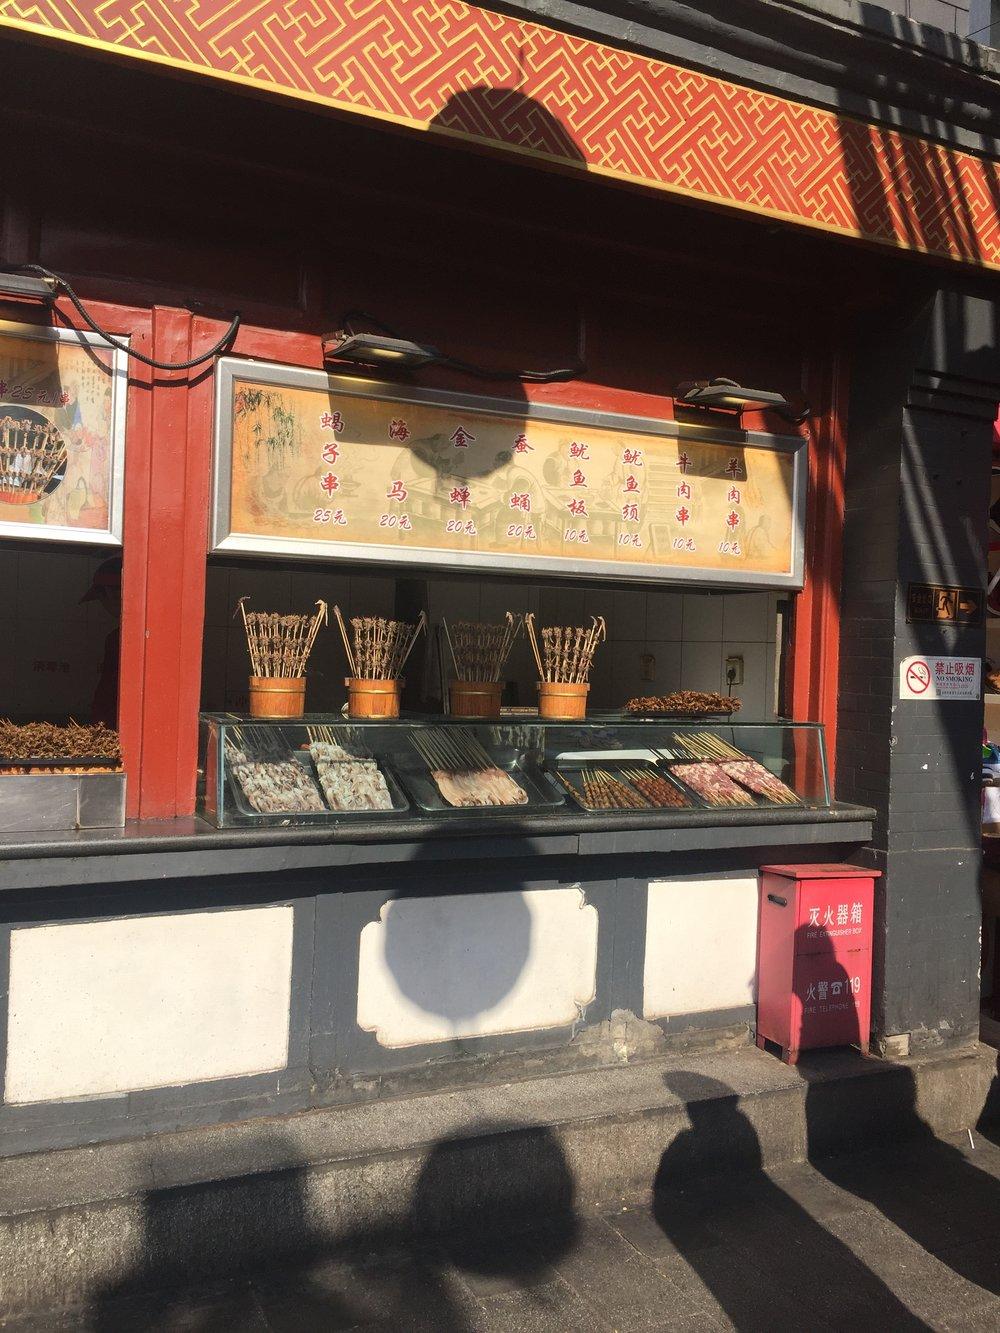 Street food - live scorpians